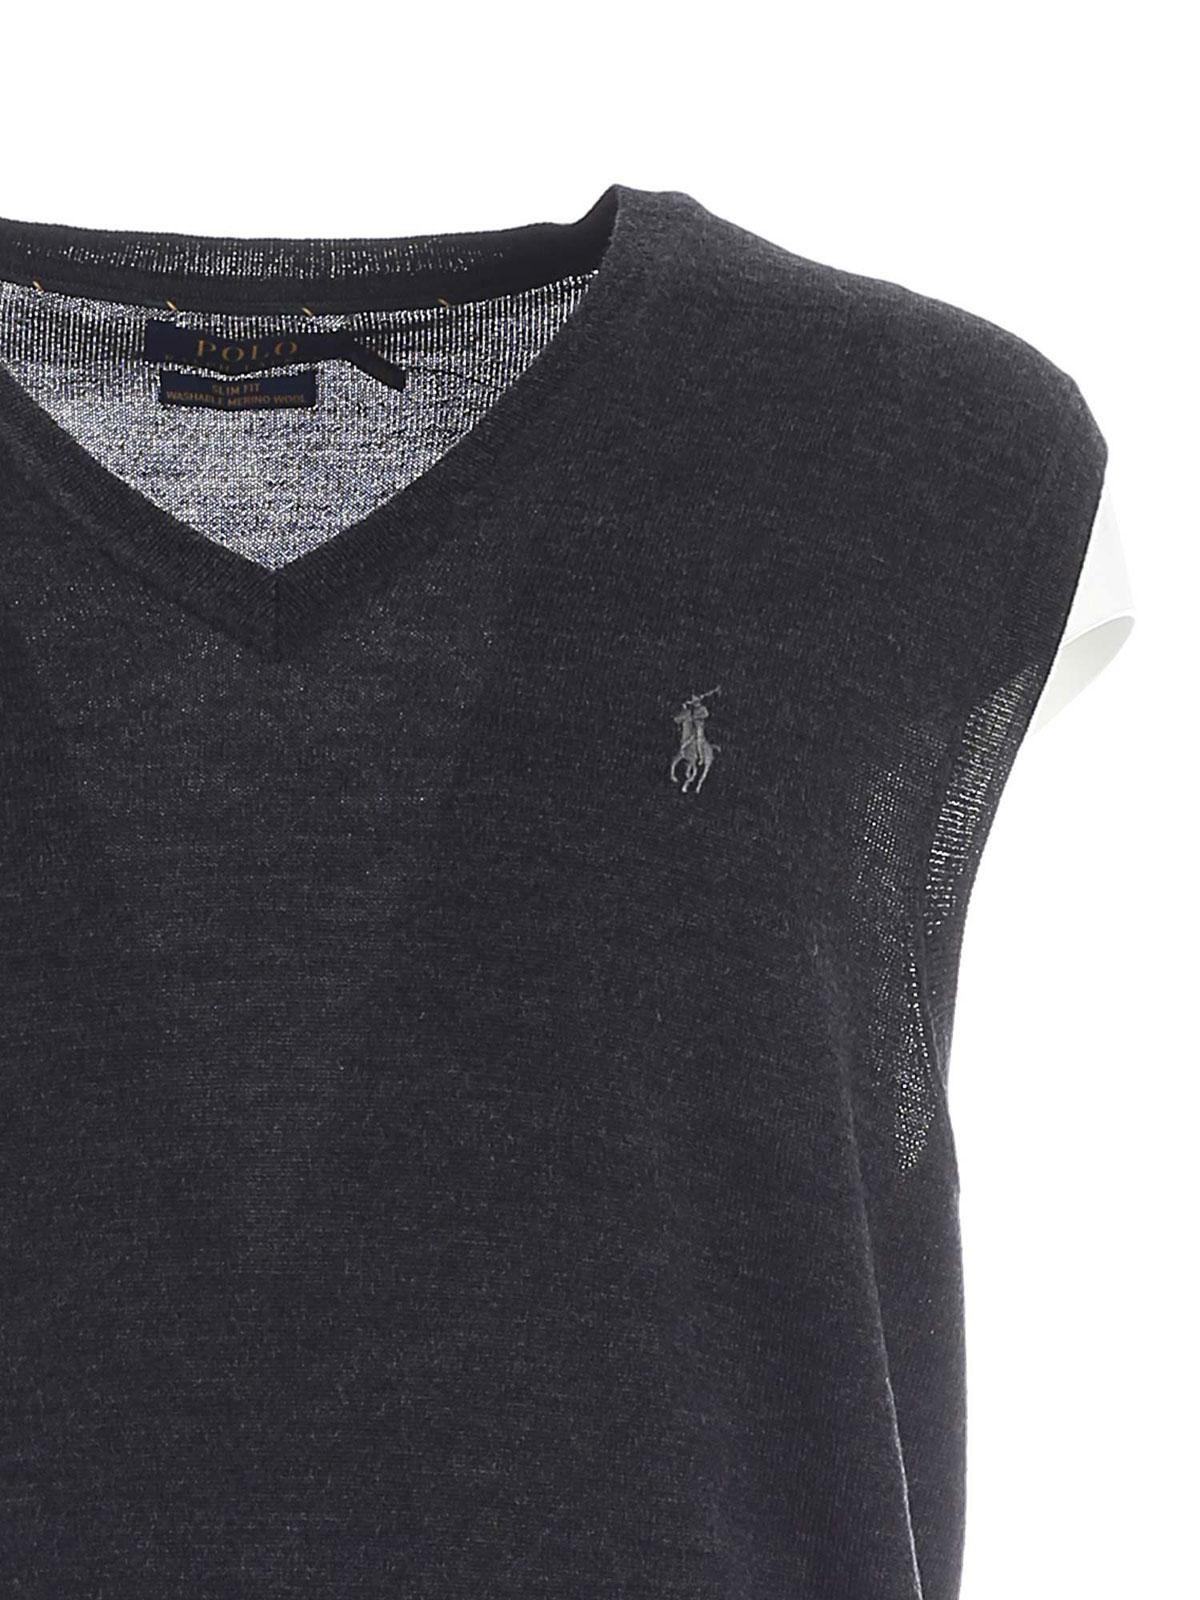 Picture of POLO RALPH LAUREN | Men's Knitted V-Neck Vest